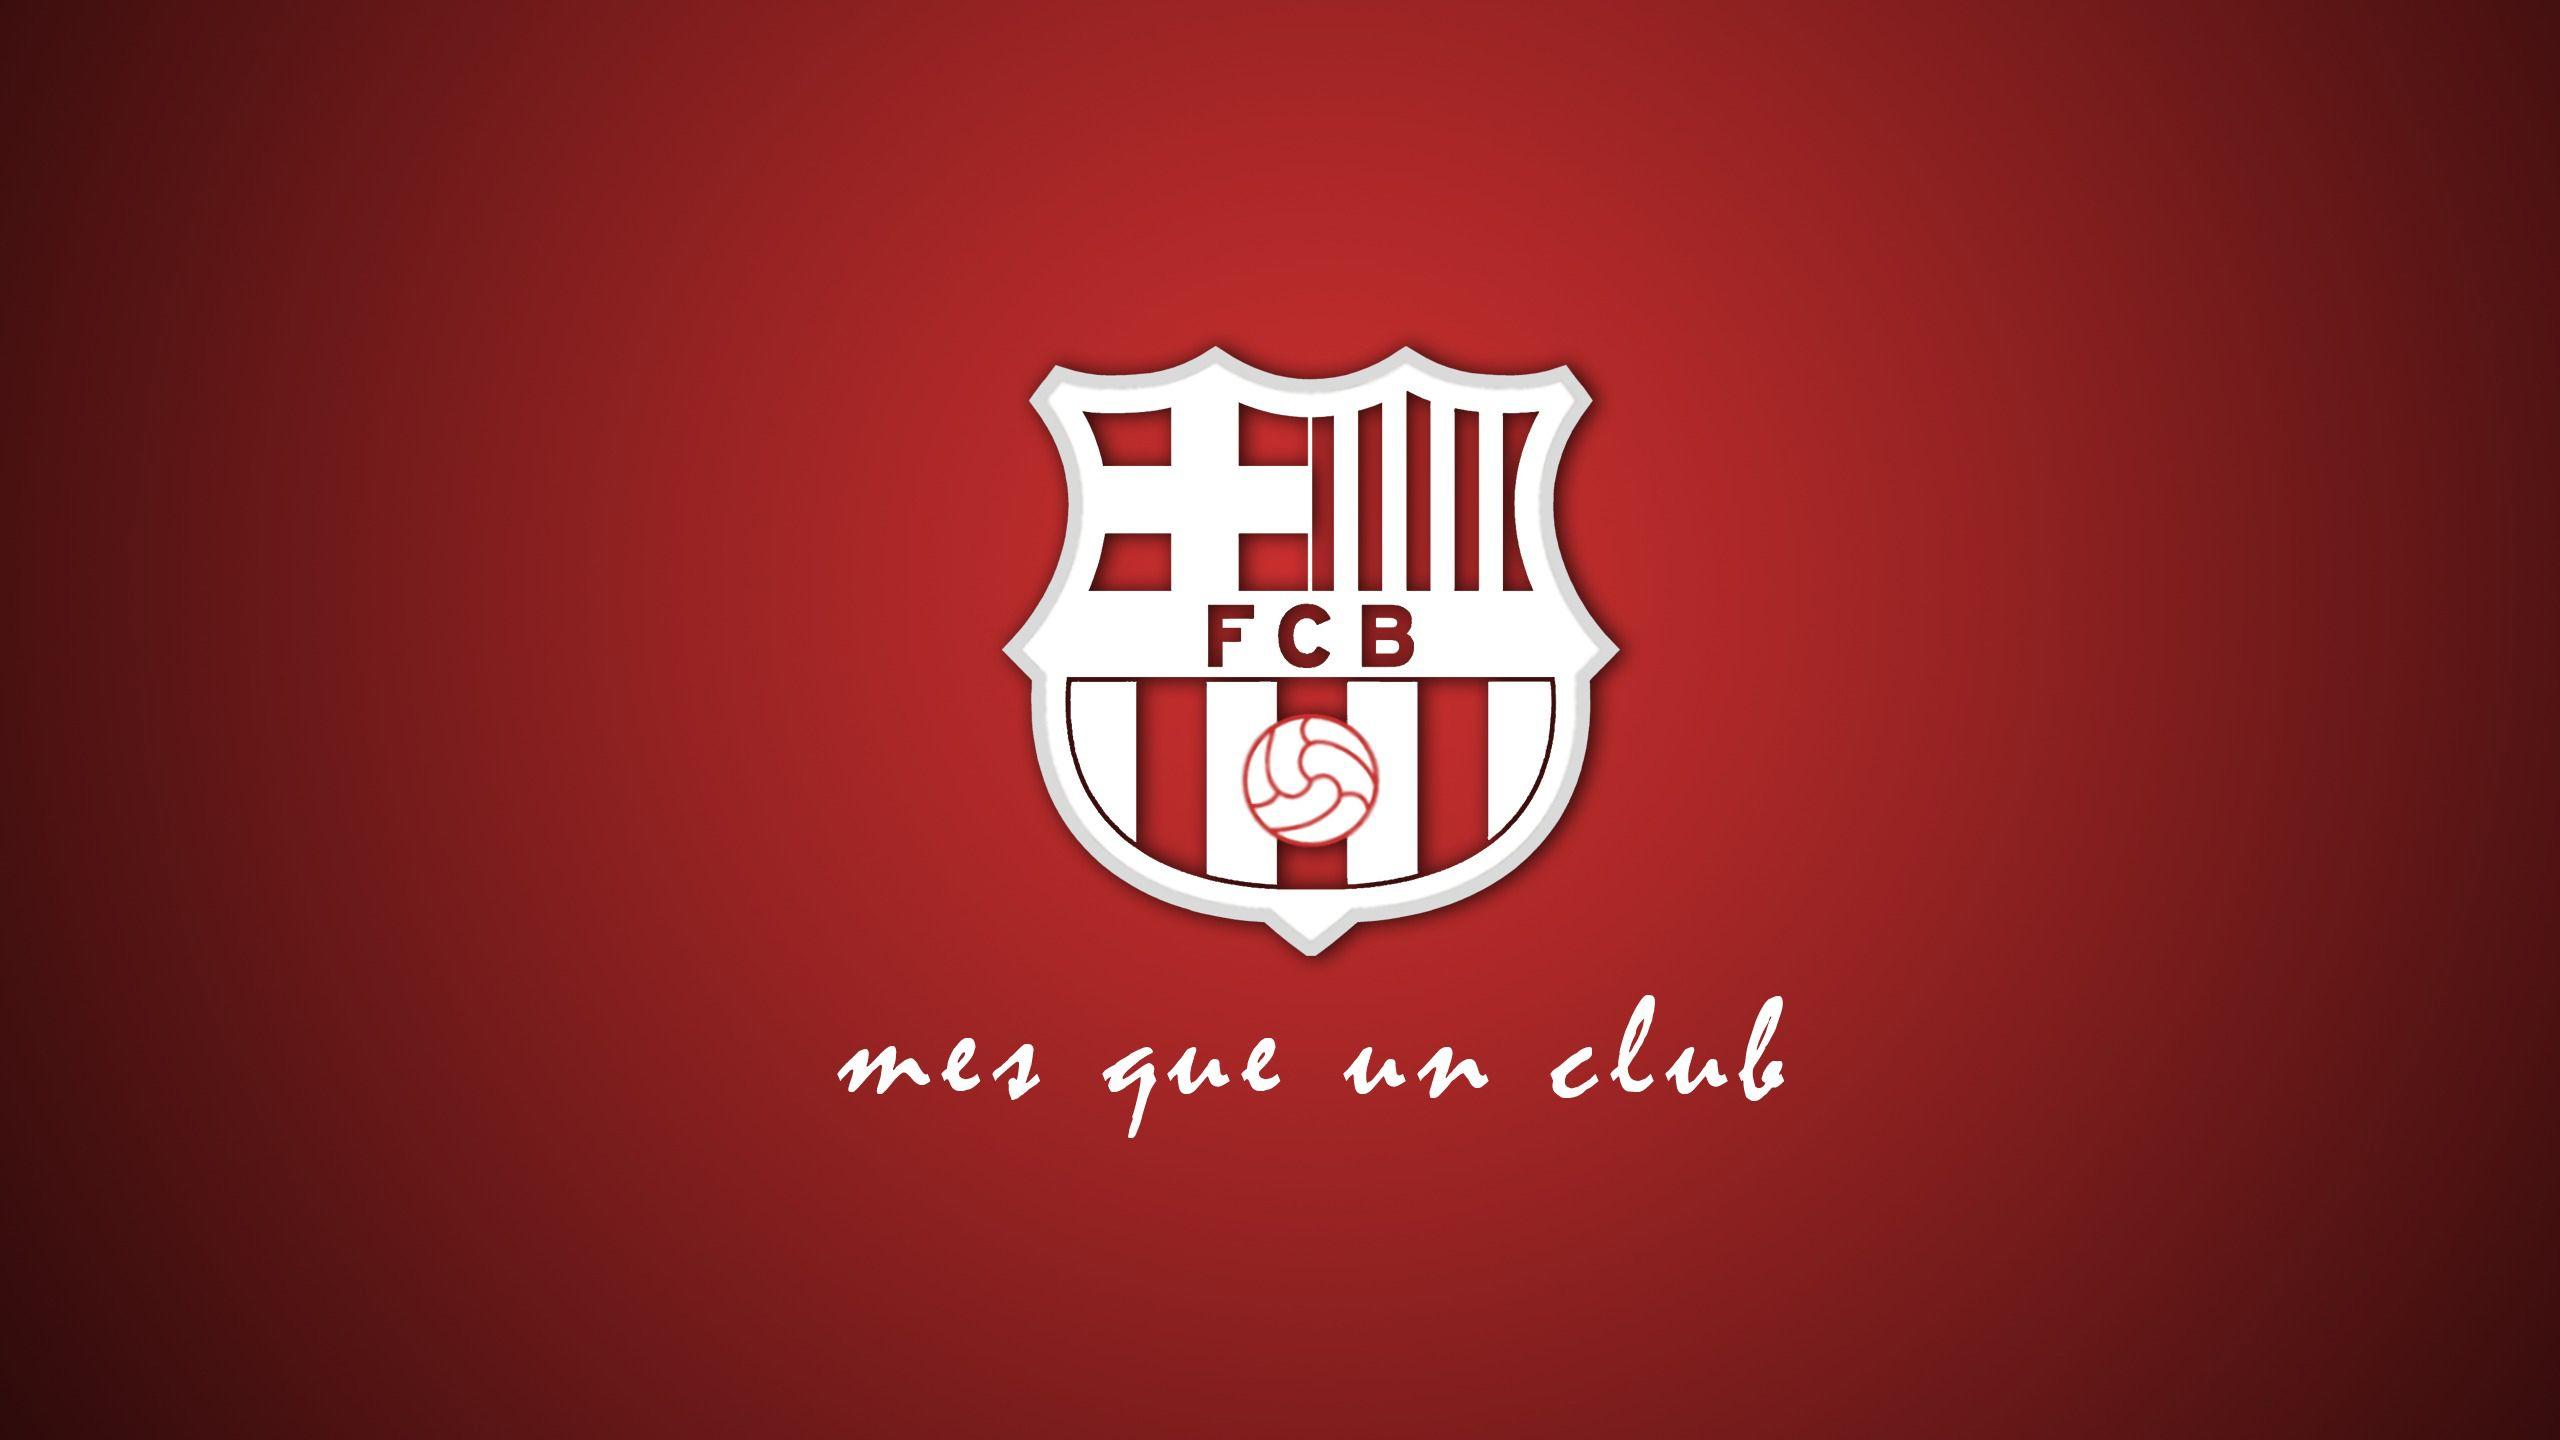 barcelona football club wallpapers